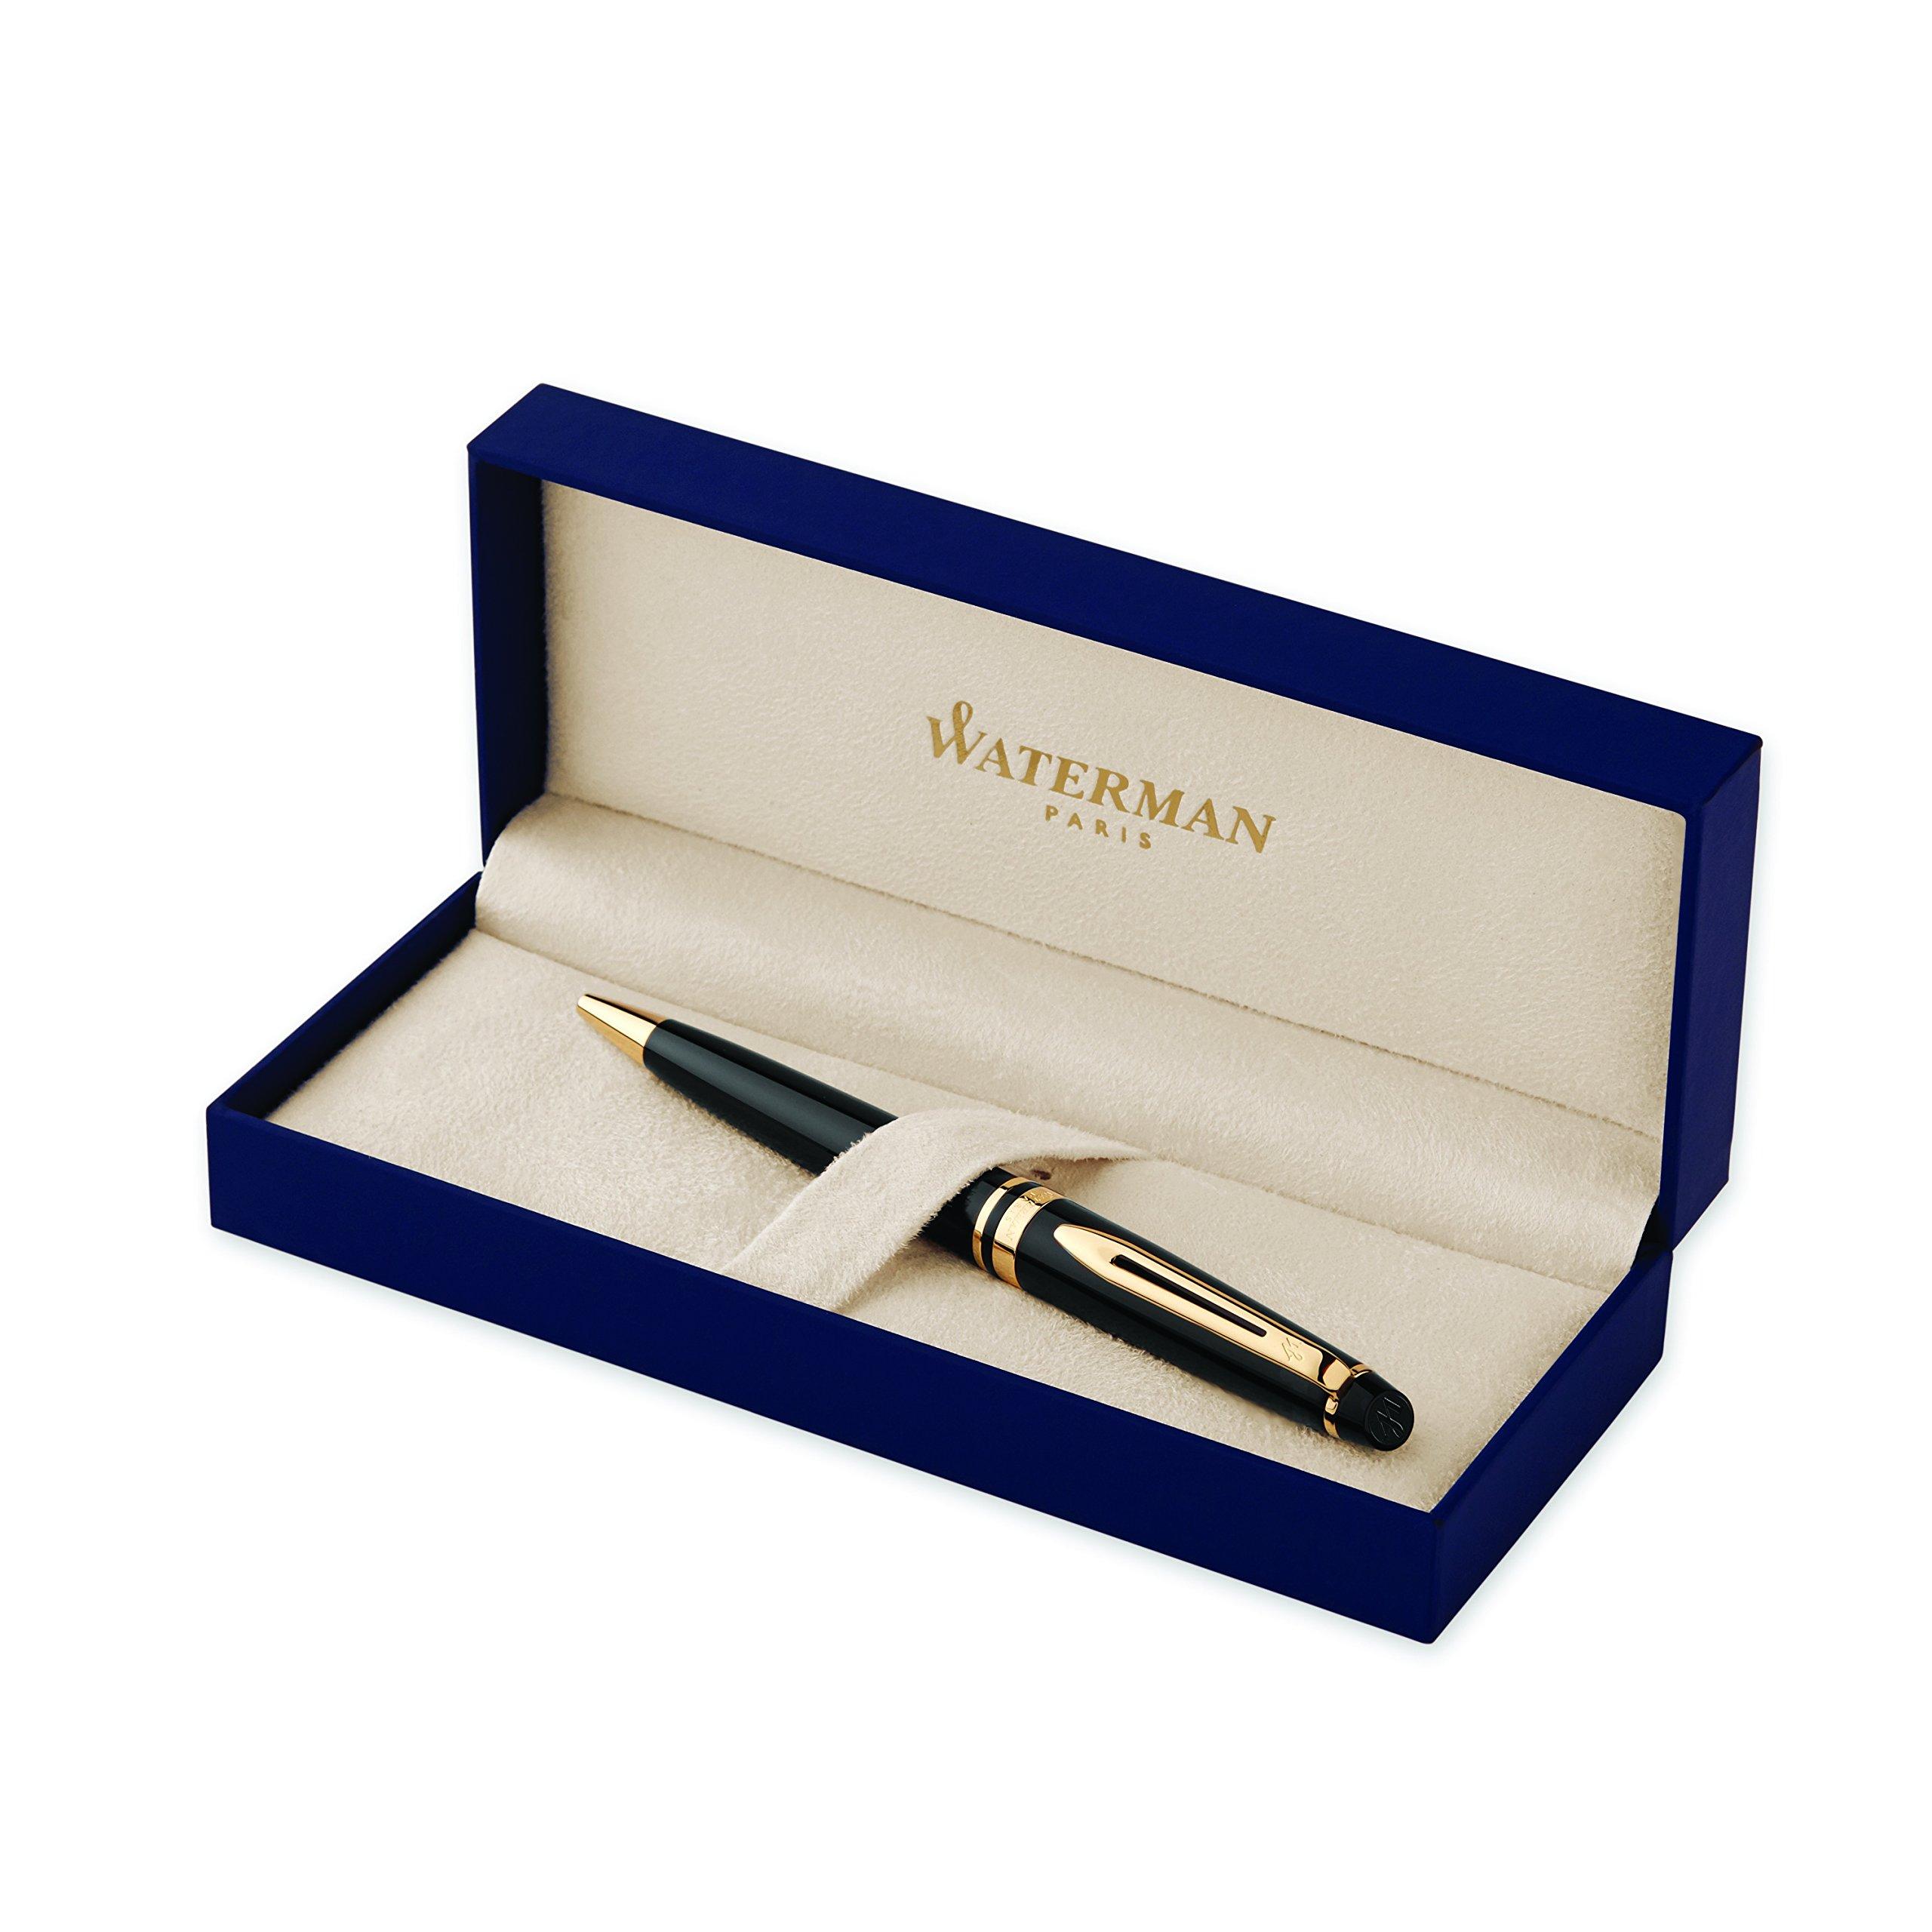 Waterman Expert Black  Ballpoint Pen GT, Medium Point, Blue Ink - S0951700